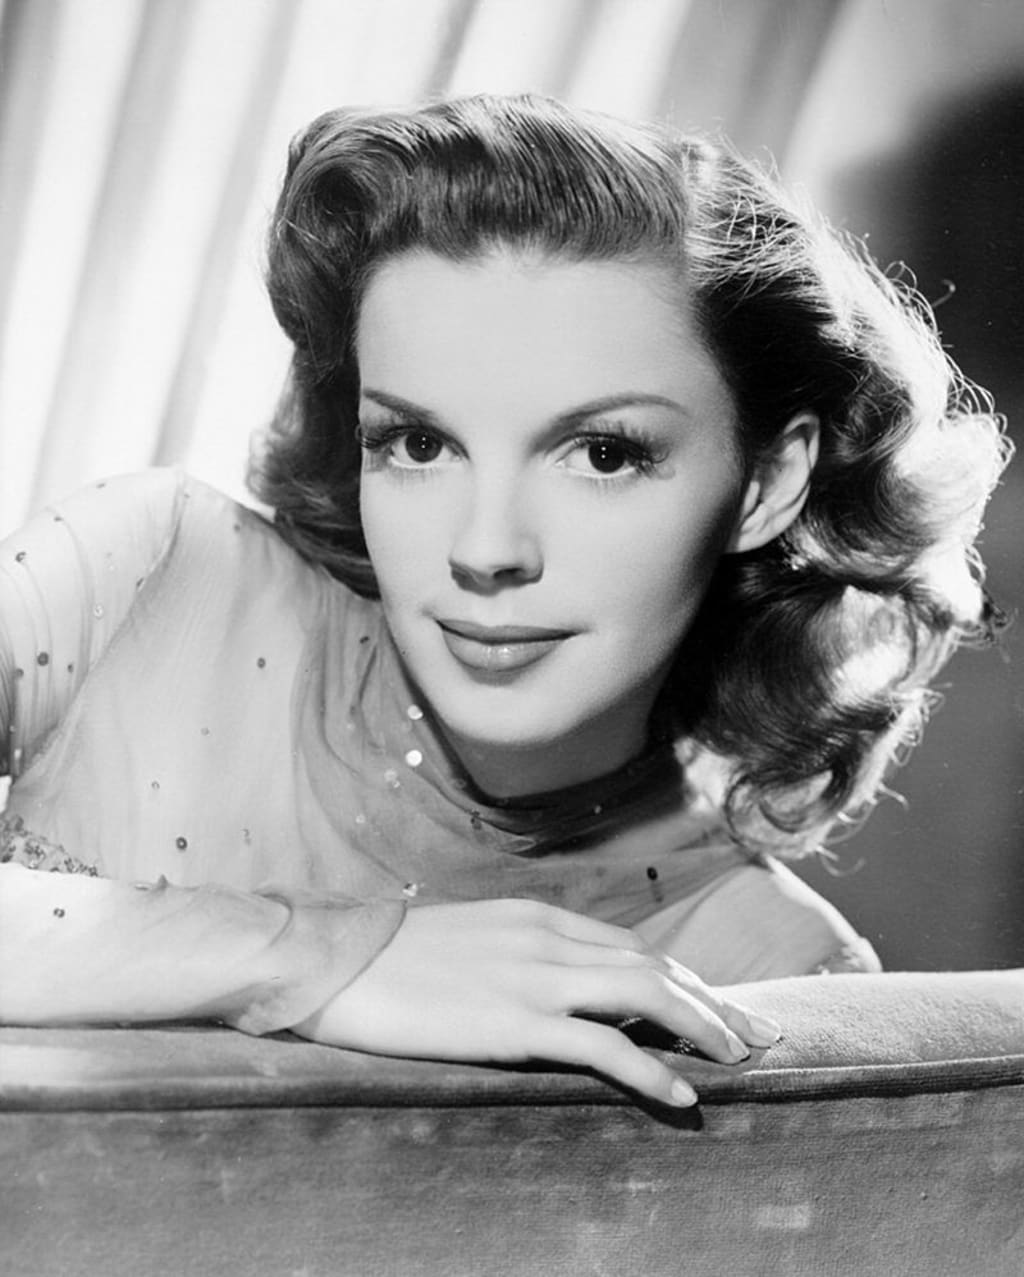 June 22 is Judy Garland Day